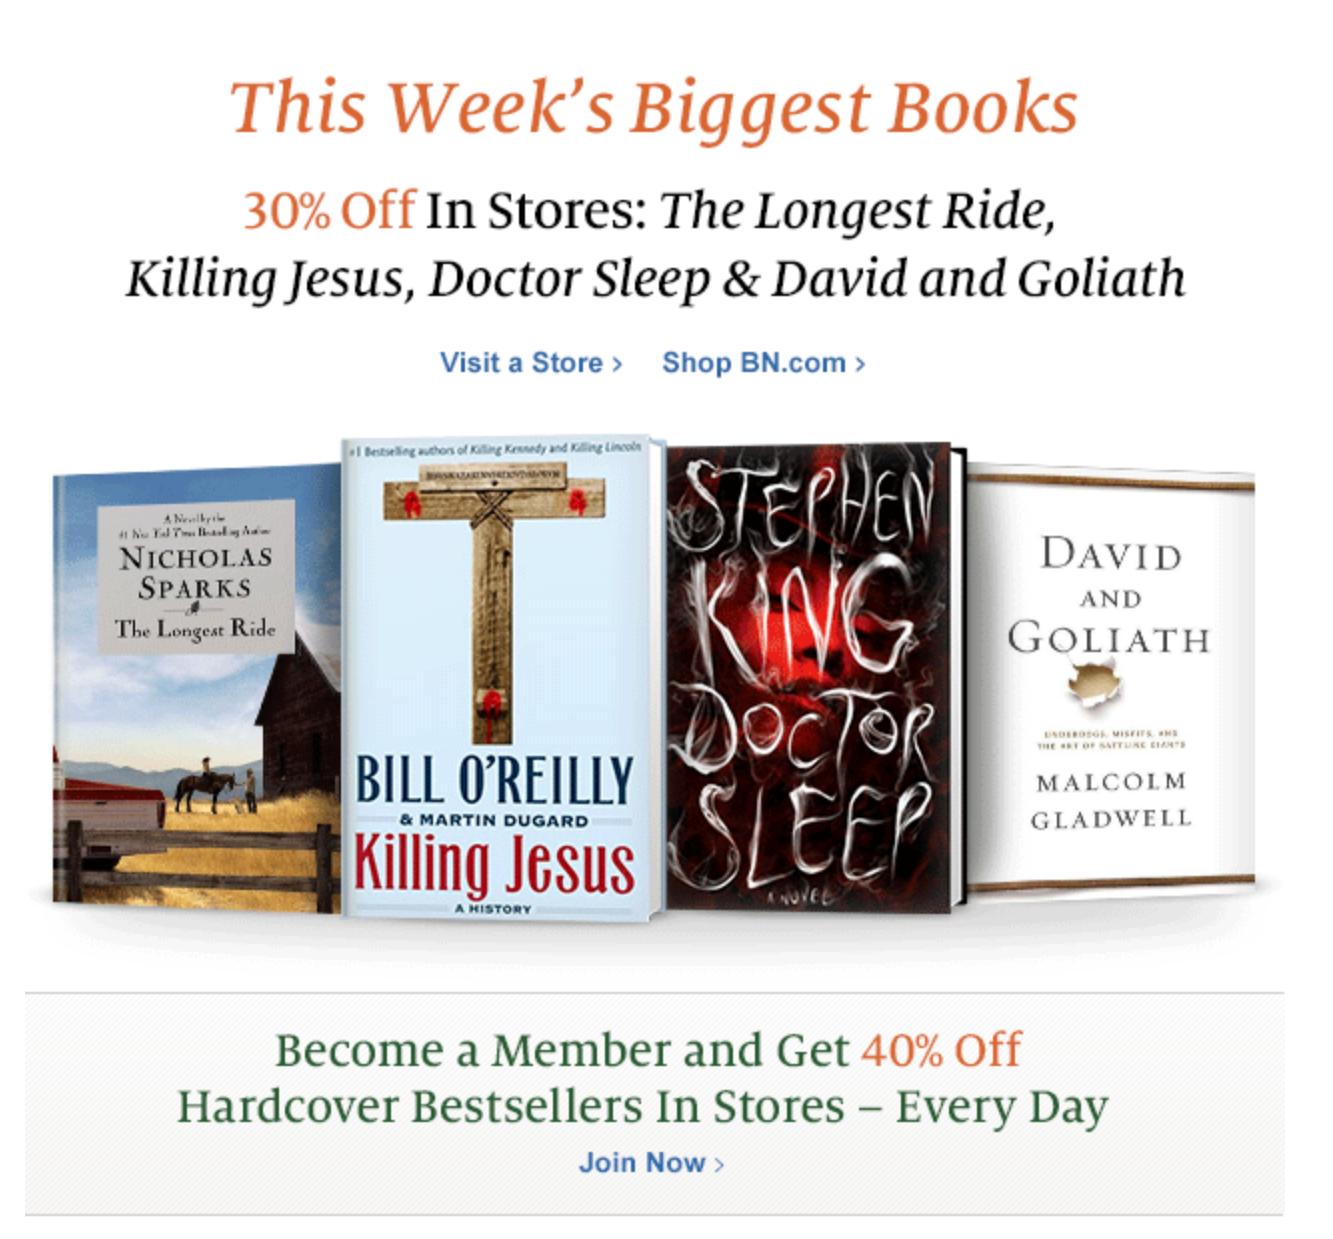 Barnes & Noble's popular books